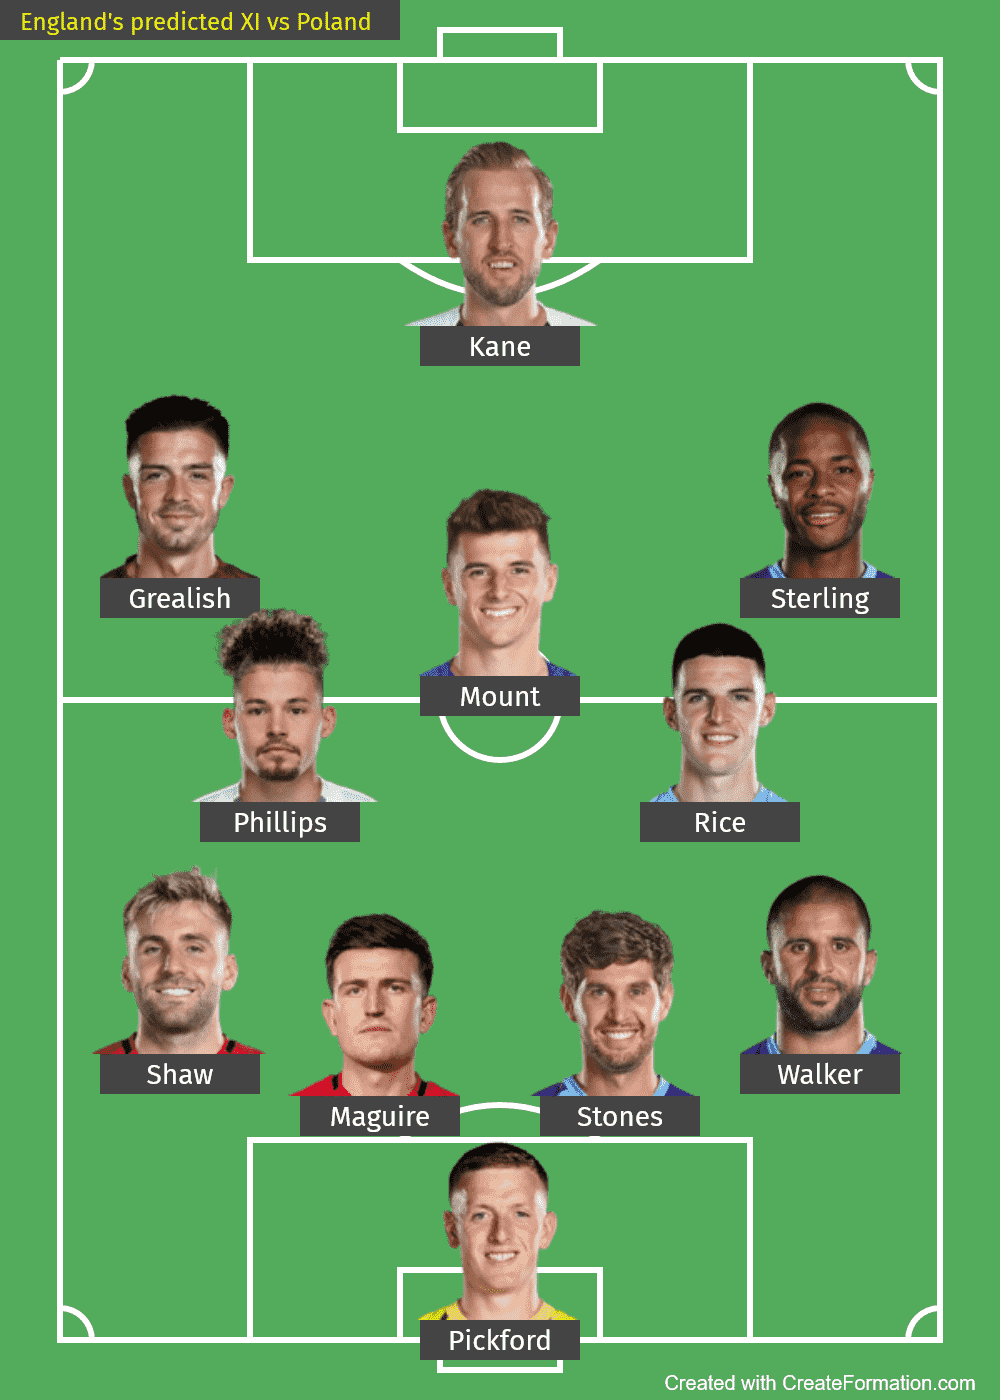 England predicted line up vs Poland